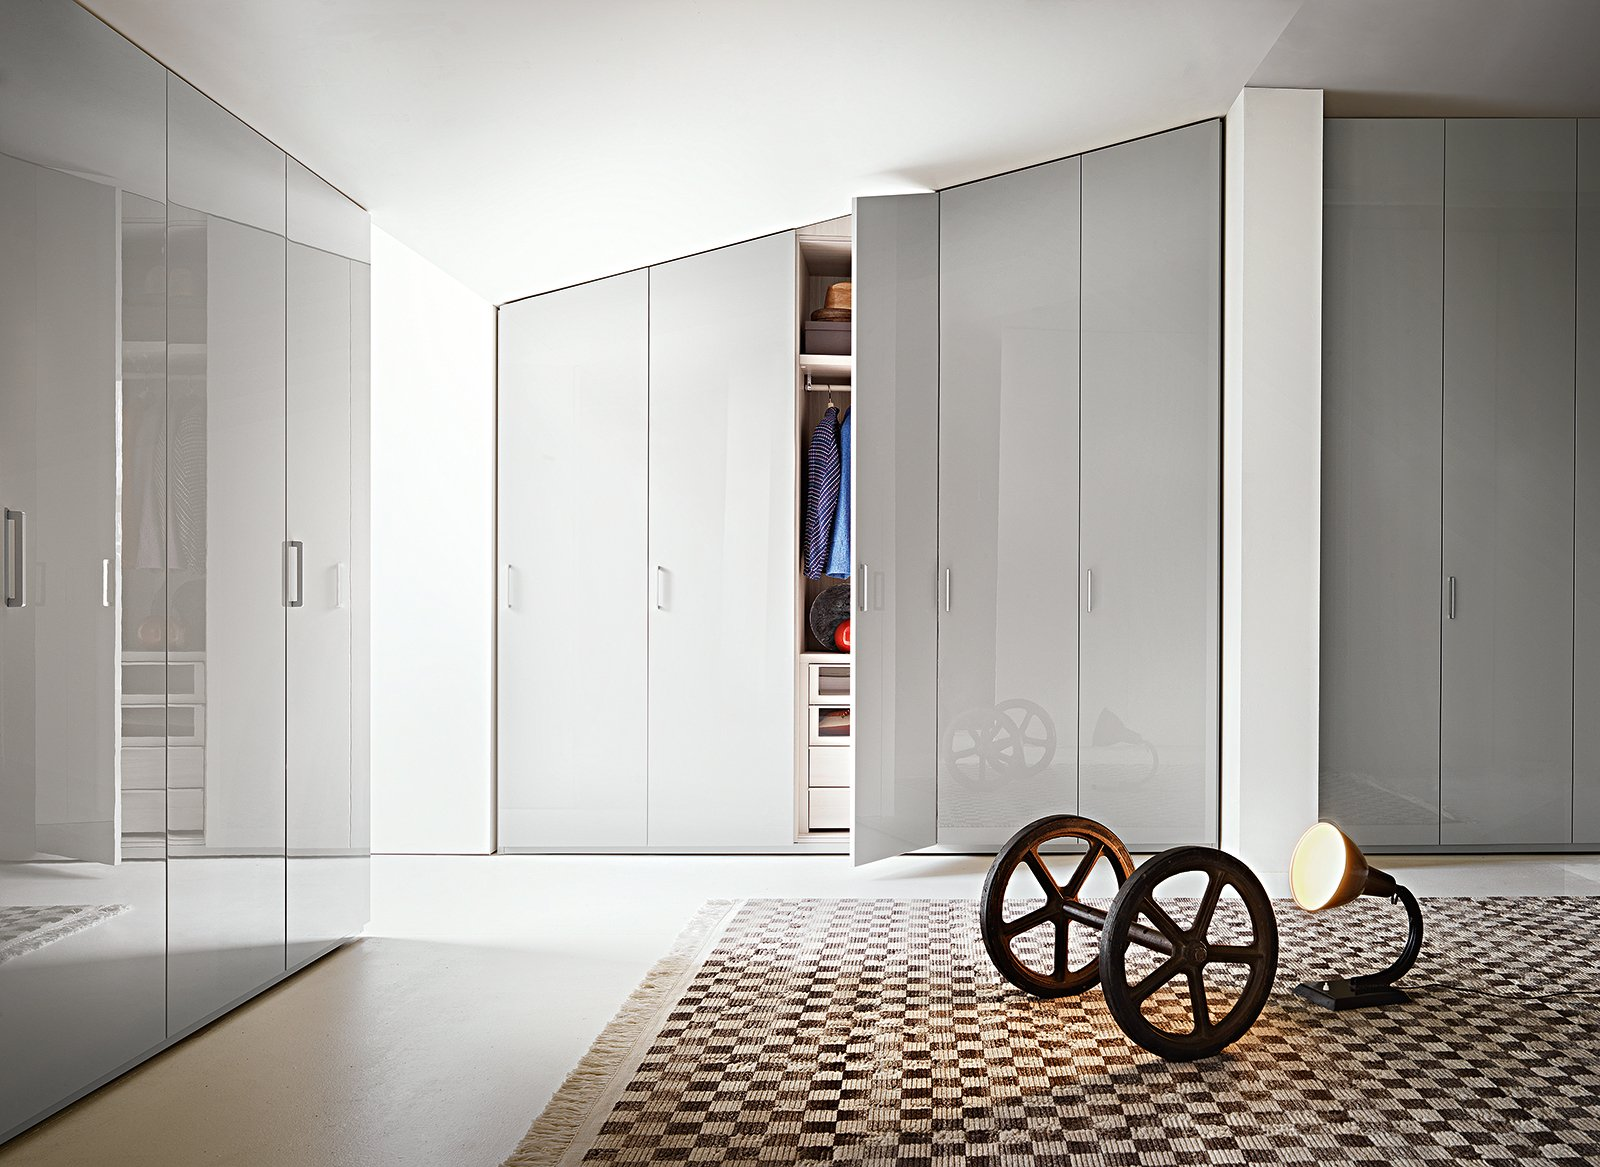 In mansarda sfruttare bene lo spazio sotto lo spiovente for Porte per mansarda